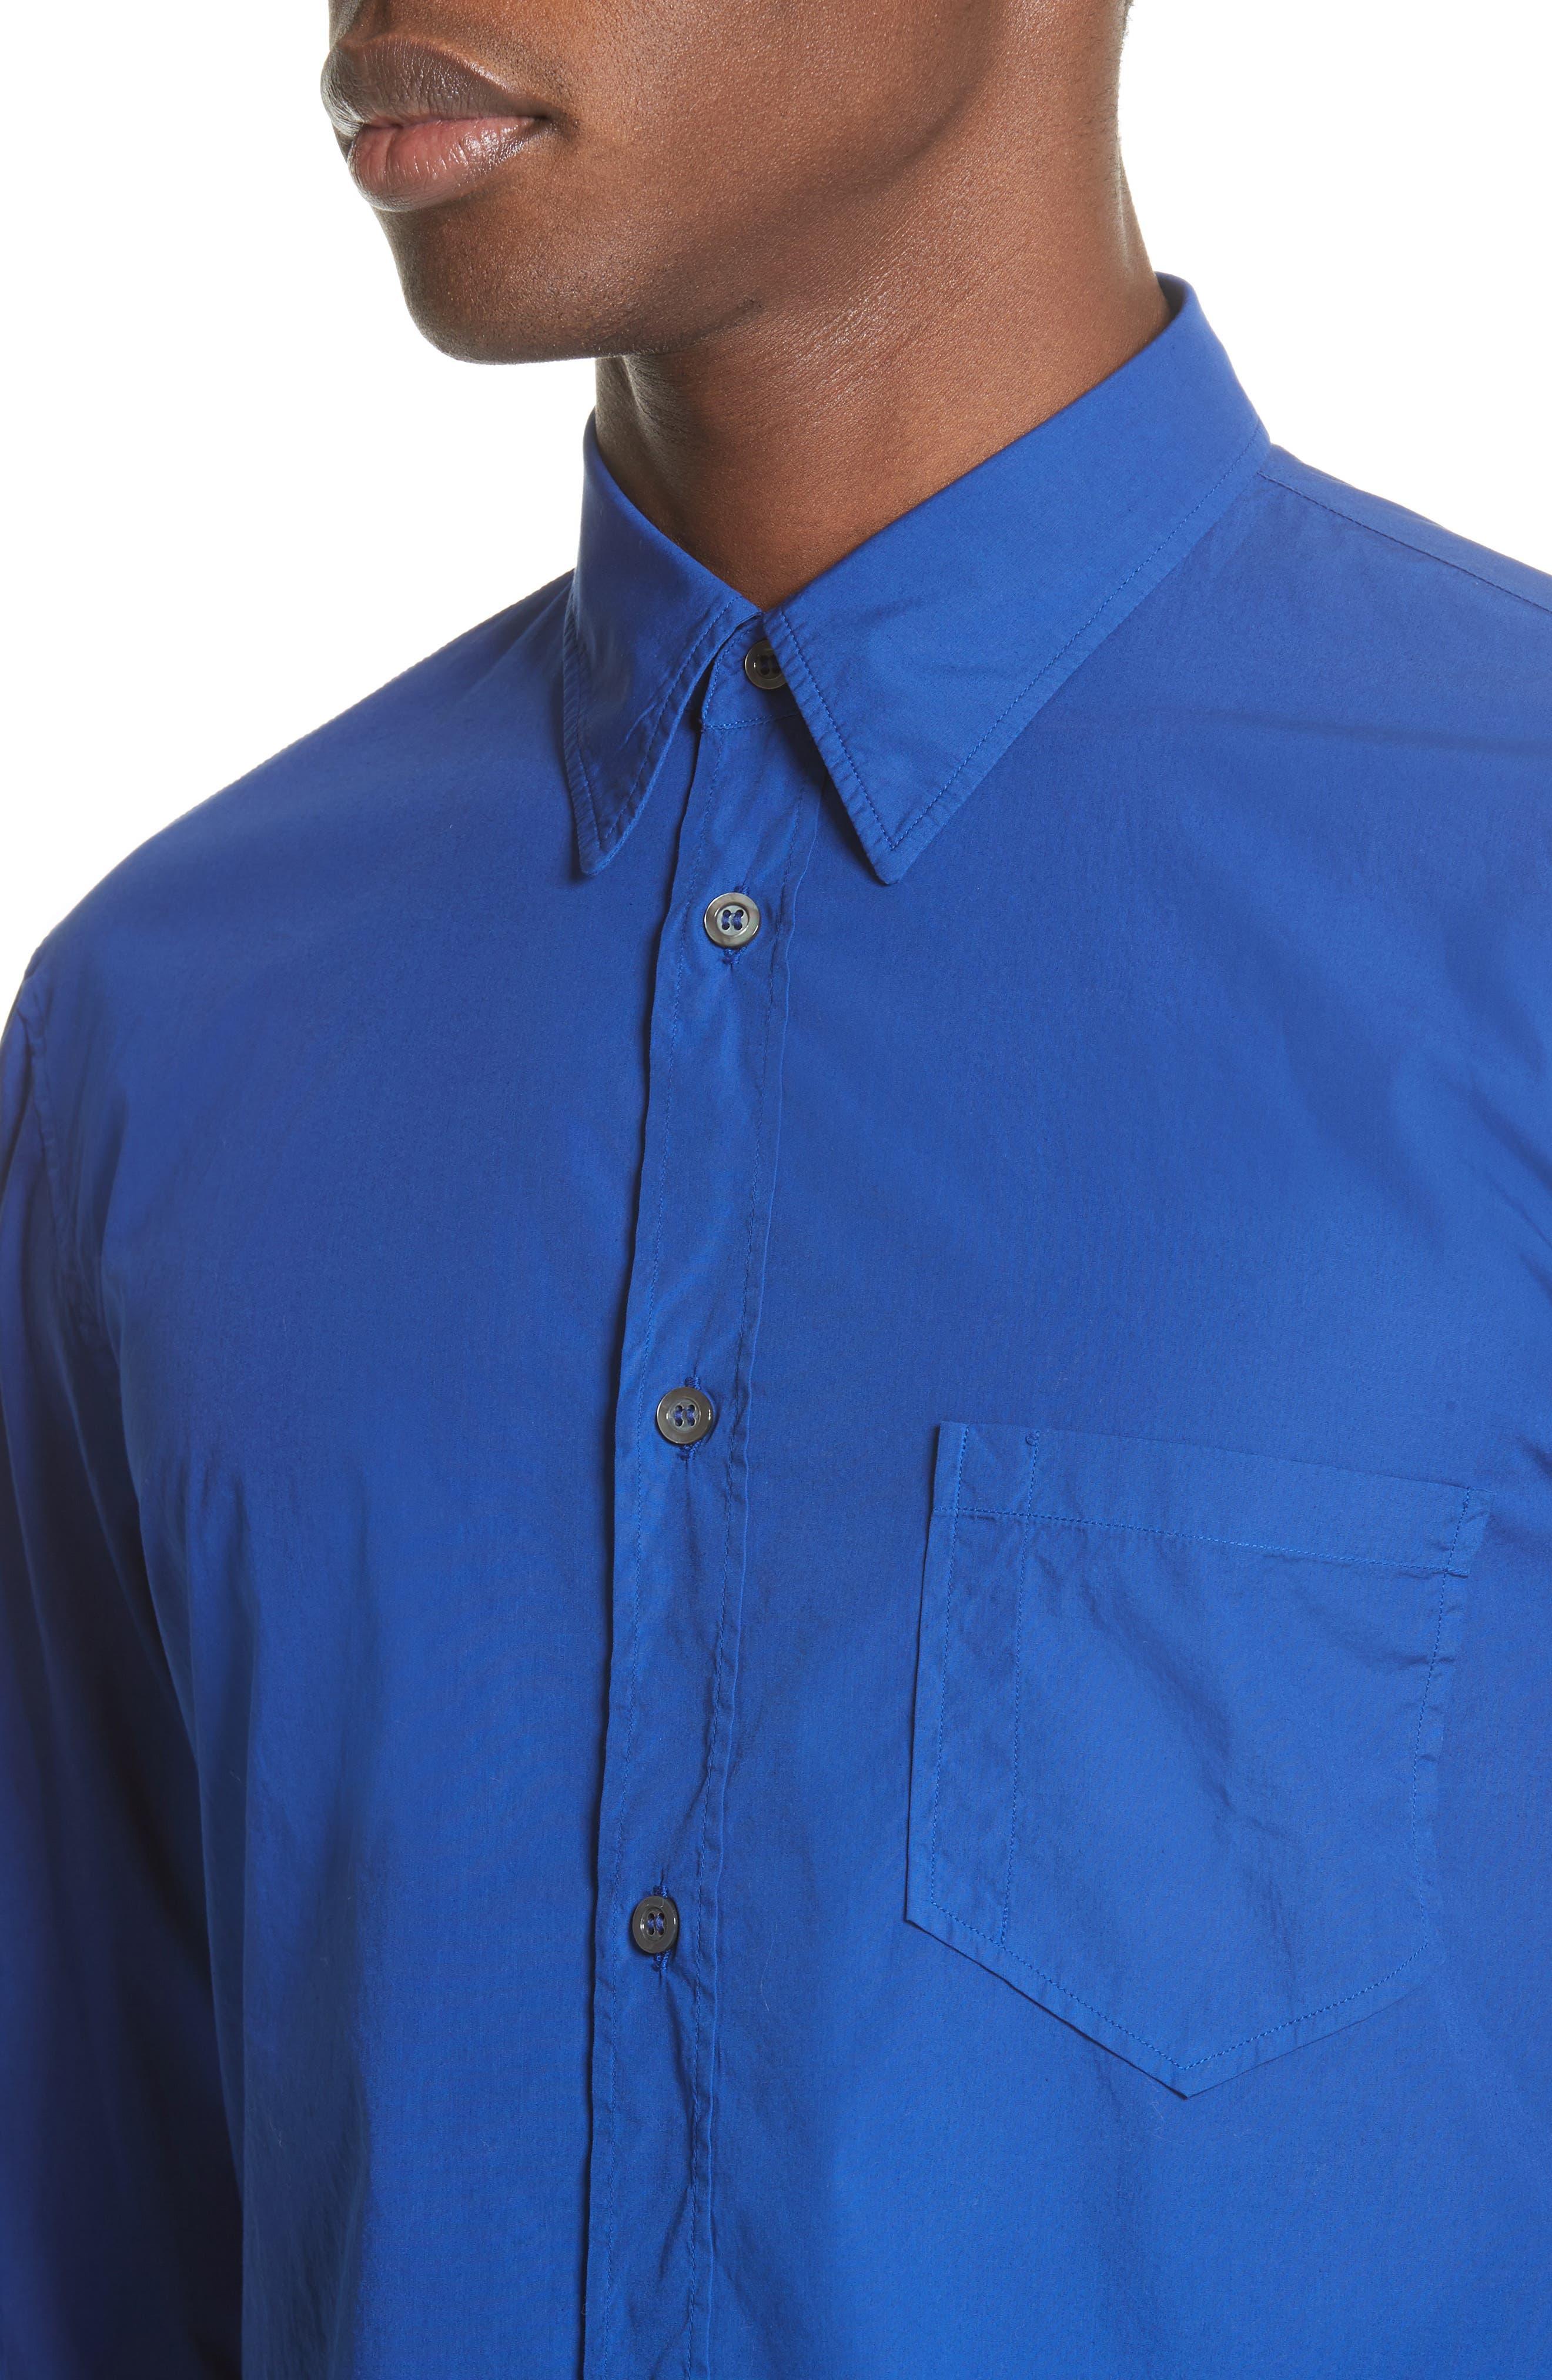 Alternate Image 2  - Maison Margiela Poplin Shirt